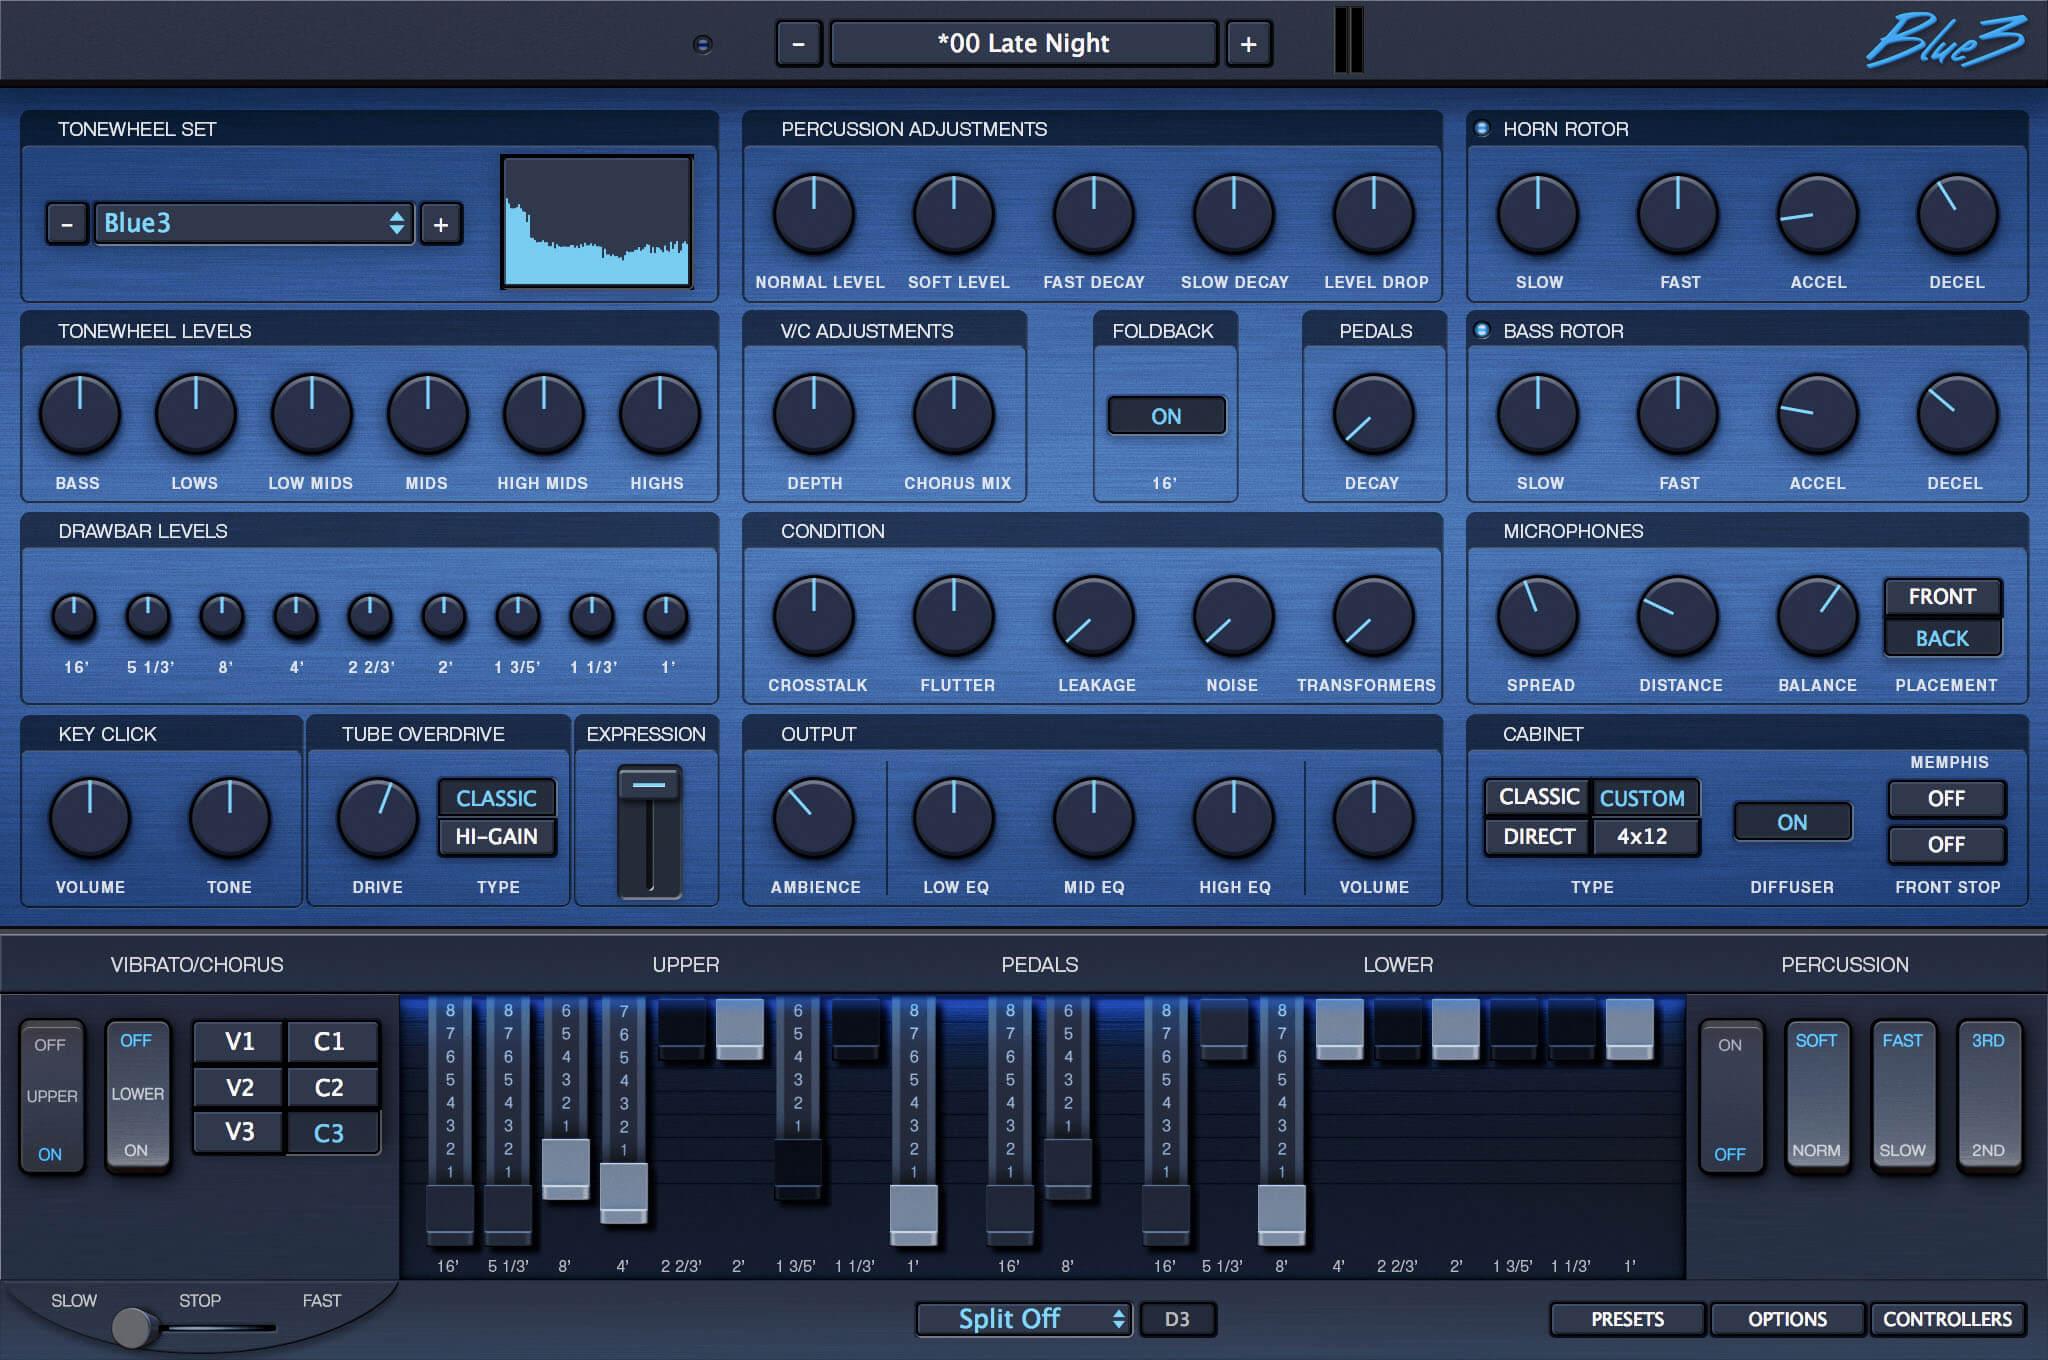 blue3 organ